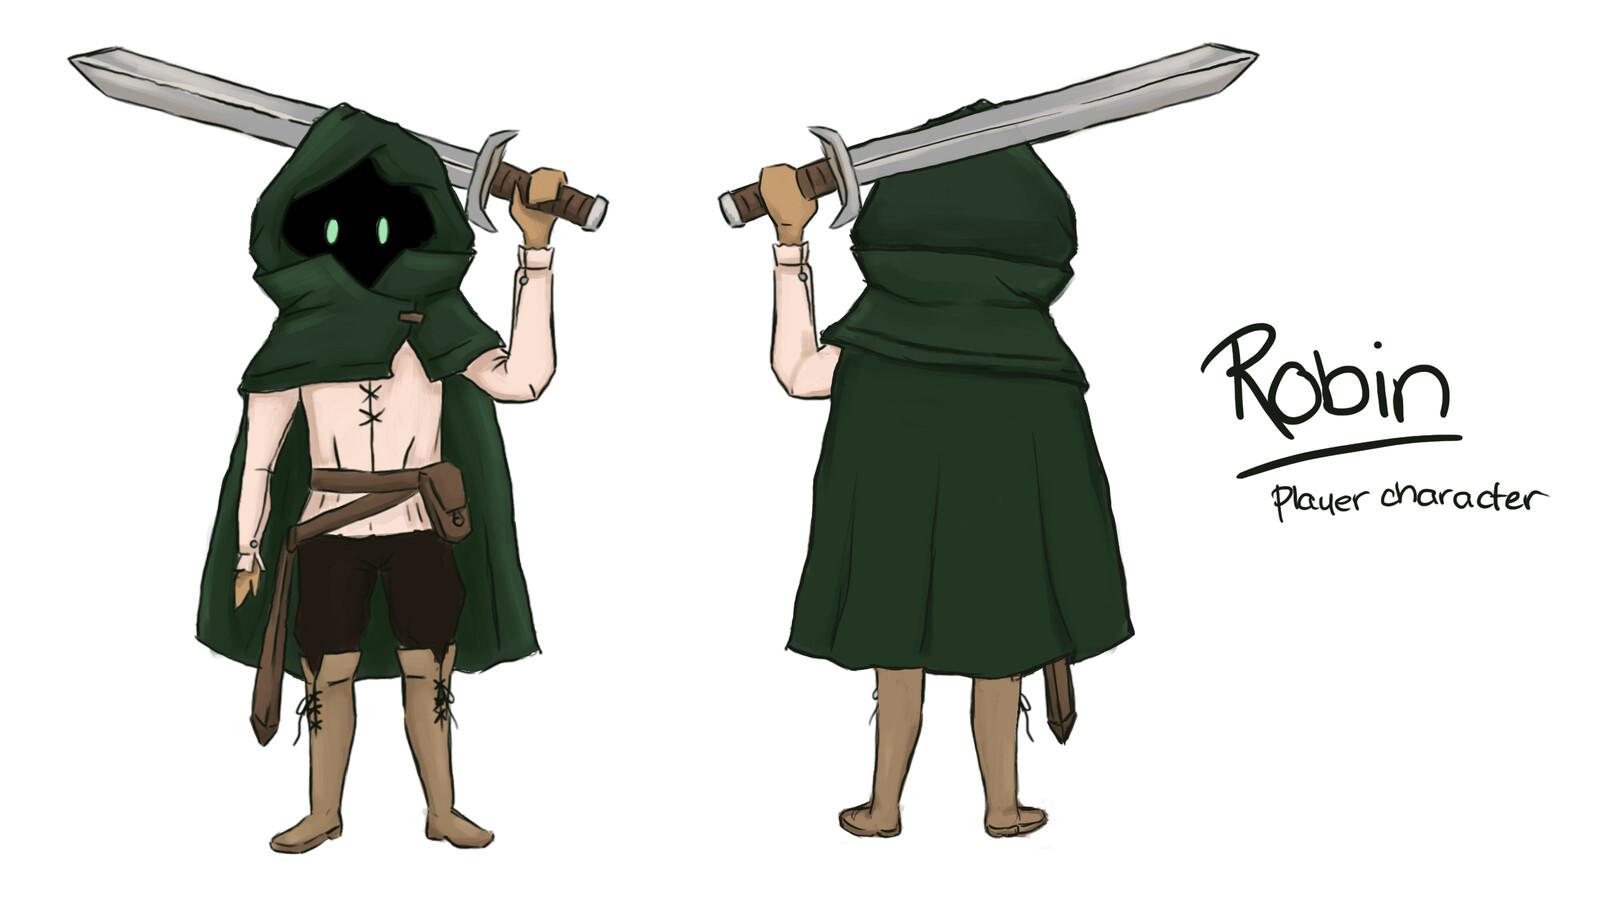 Hubbeston | Robin; the Wandering Adventurer